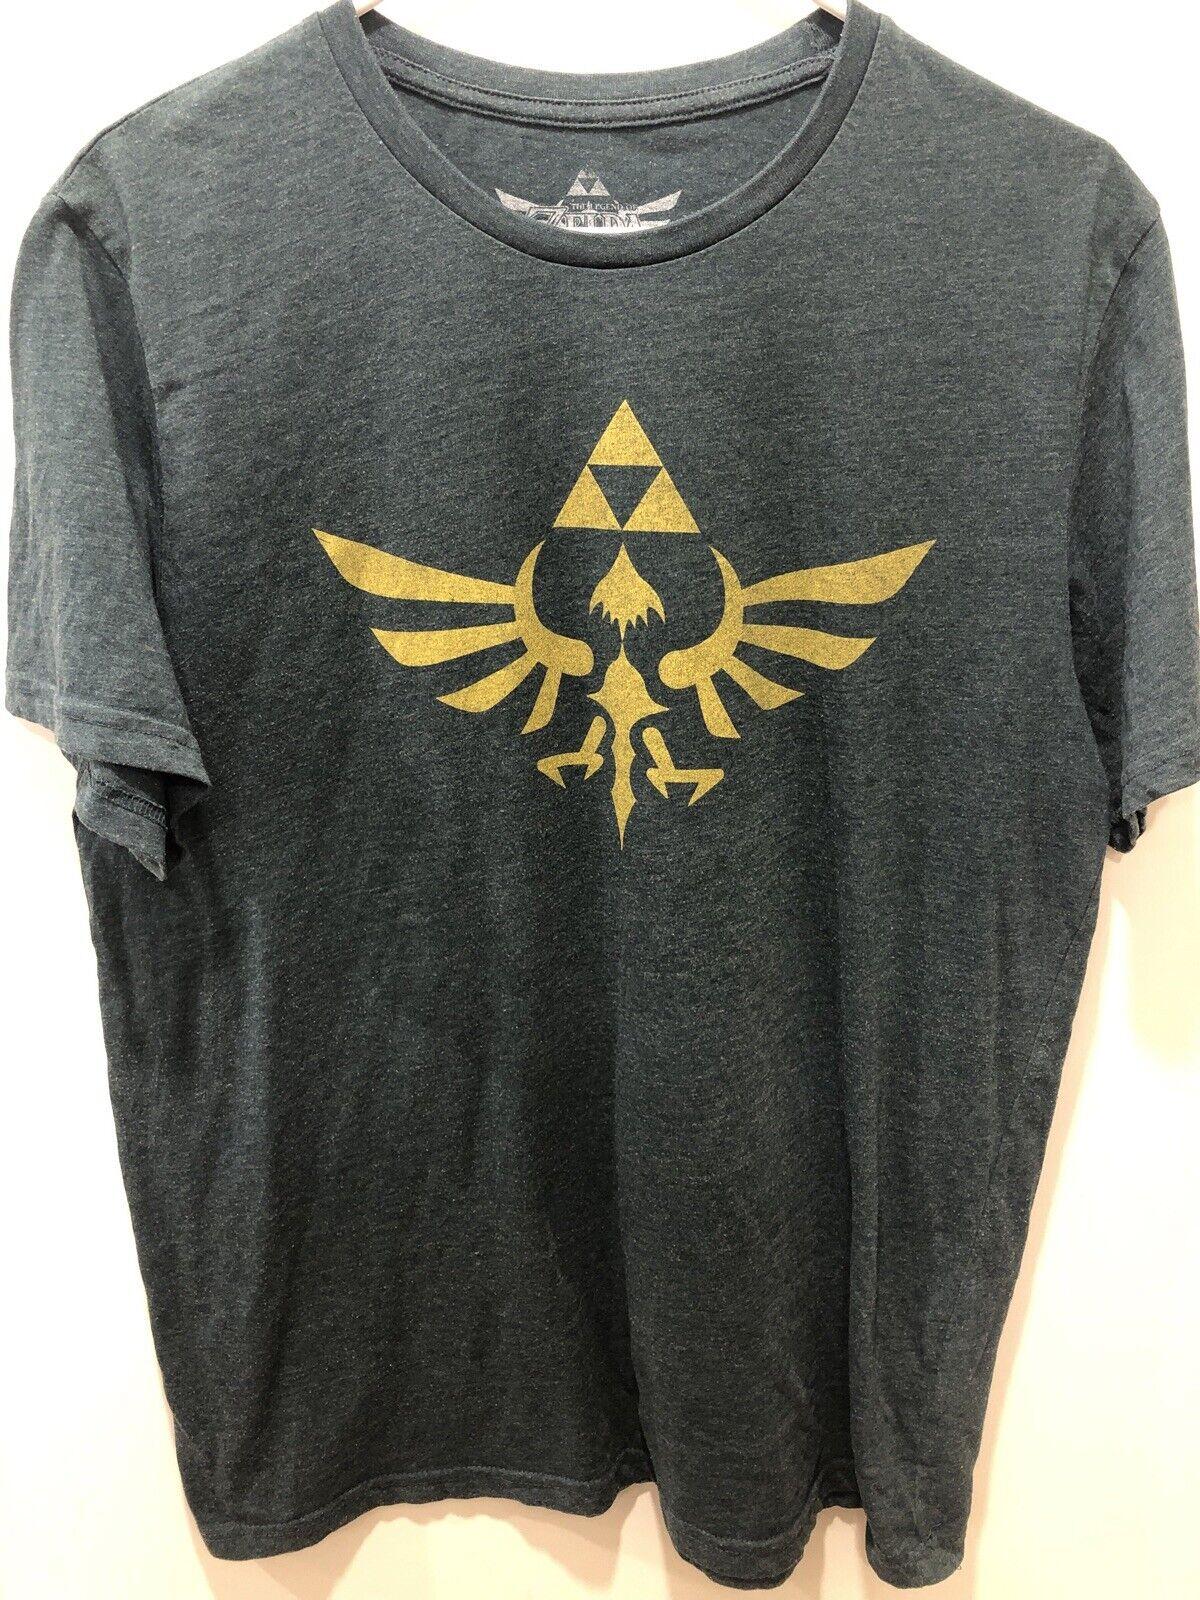 9x Vintage Large T-Shirt Lot Mortal Kombat, Deadp… - image 9